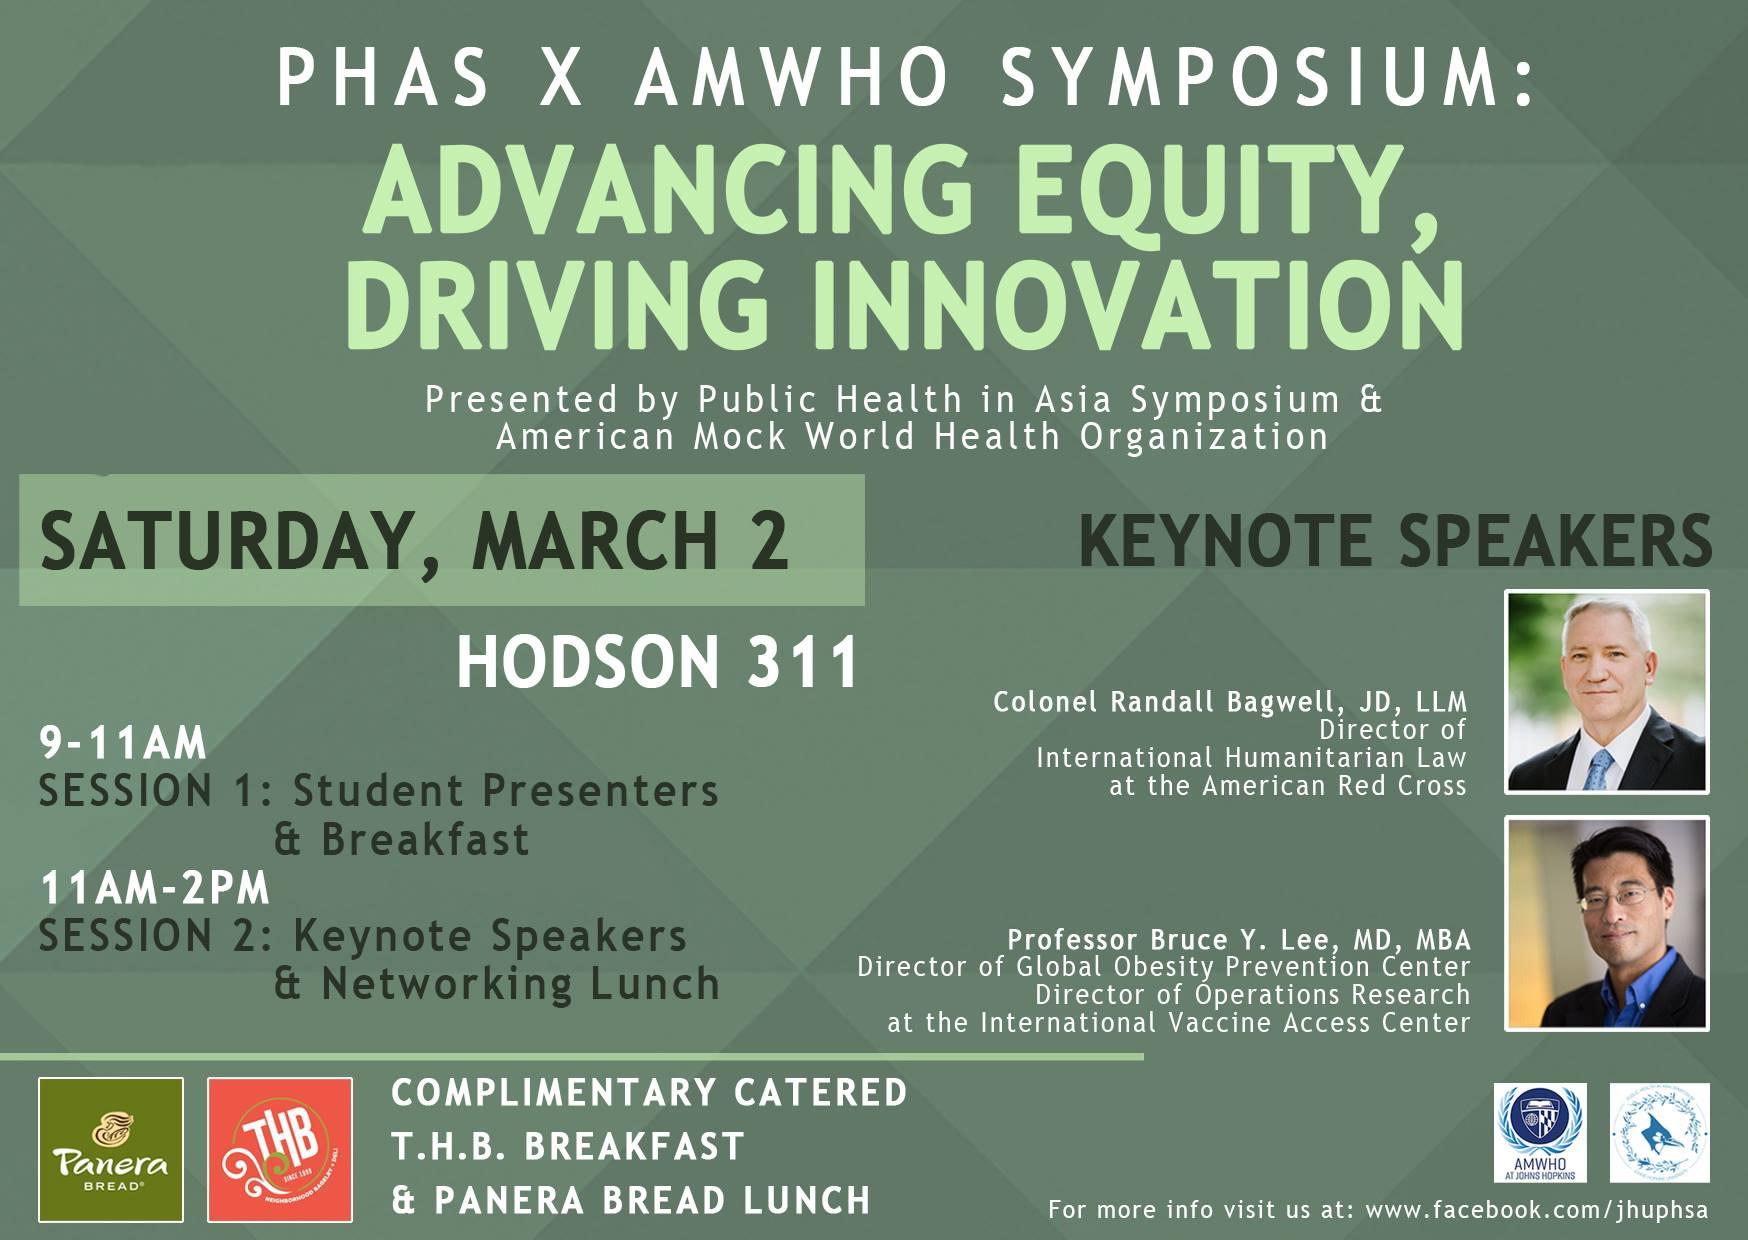 The Public Health in Asia Symposium March 2